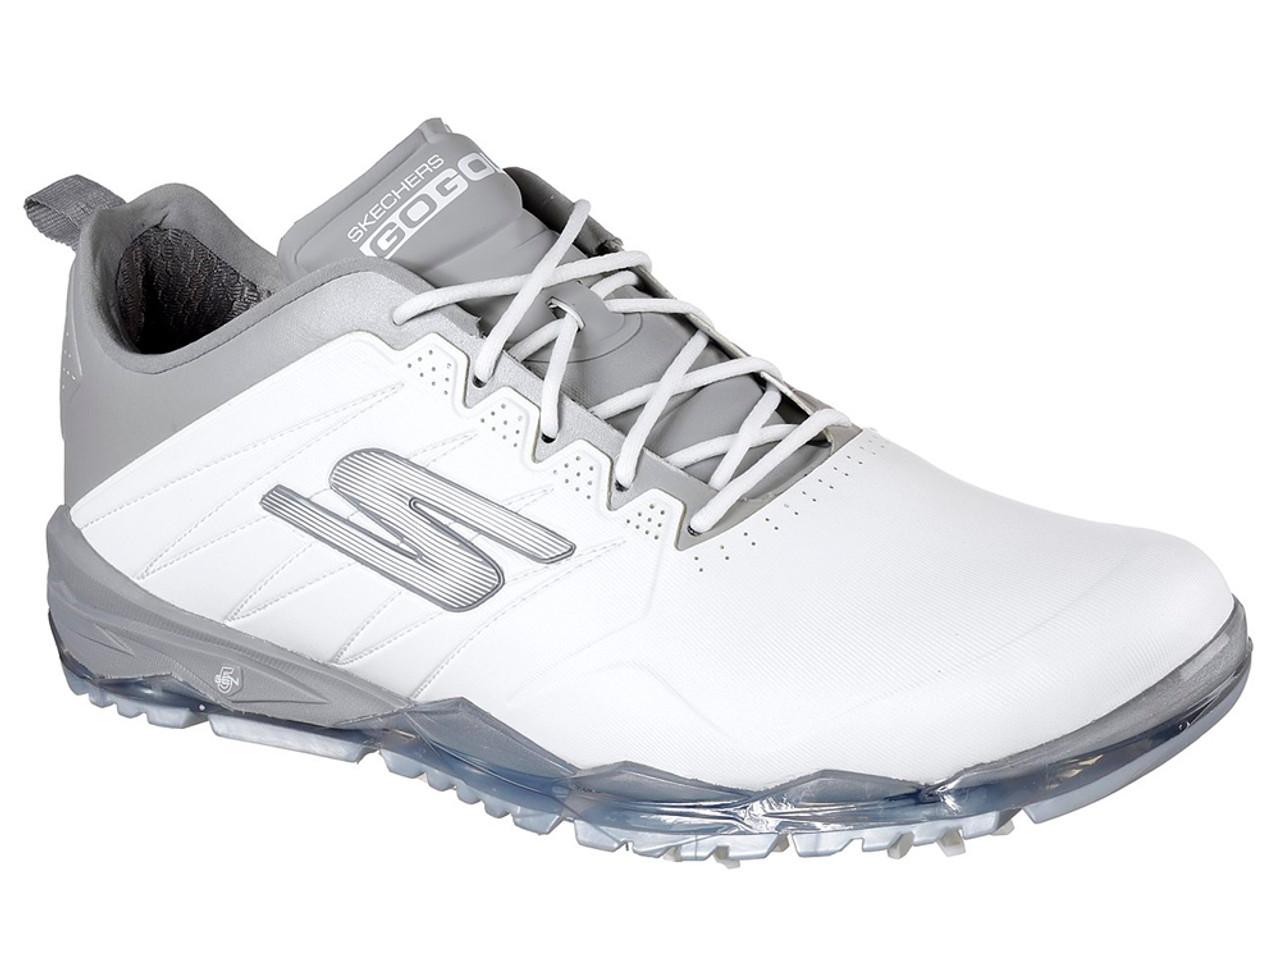 Skechers Go Golf Focus 2 Golf Shoes - White Grey - Mens For Sale ... fdf08fd4882b